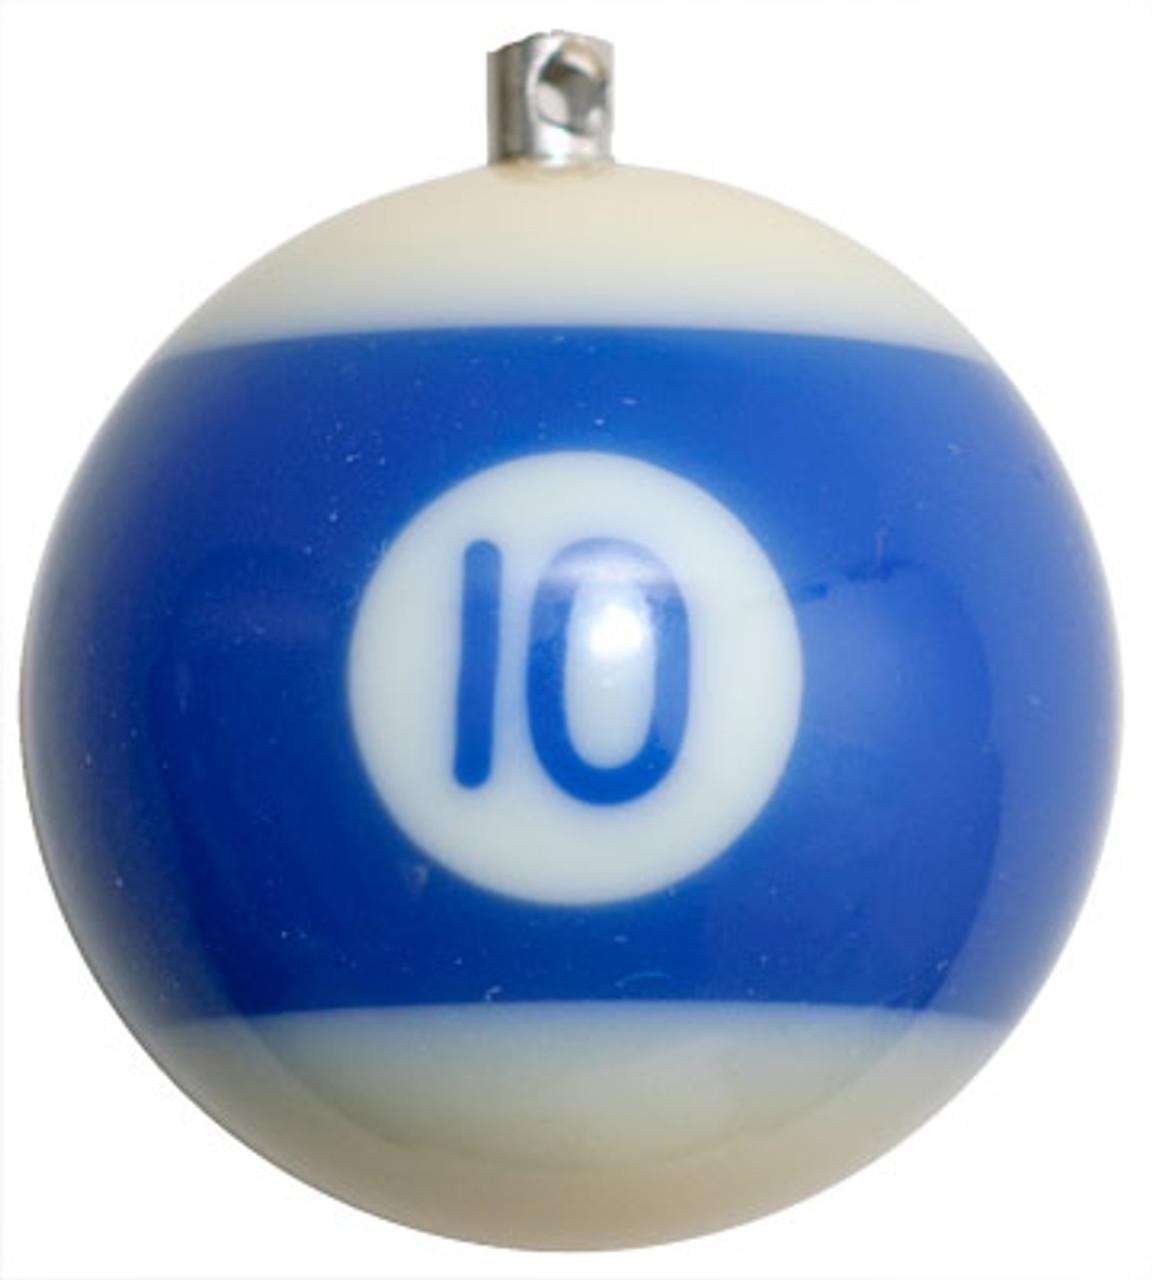 Billiard Ball Christmas Tree Ornaments - #10